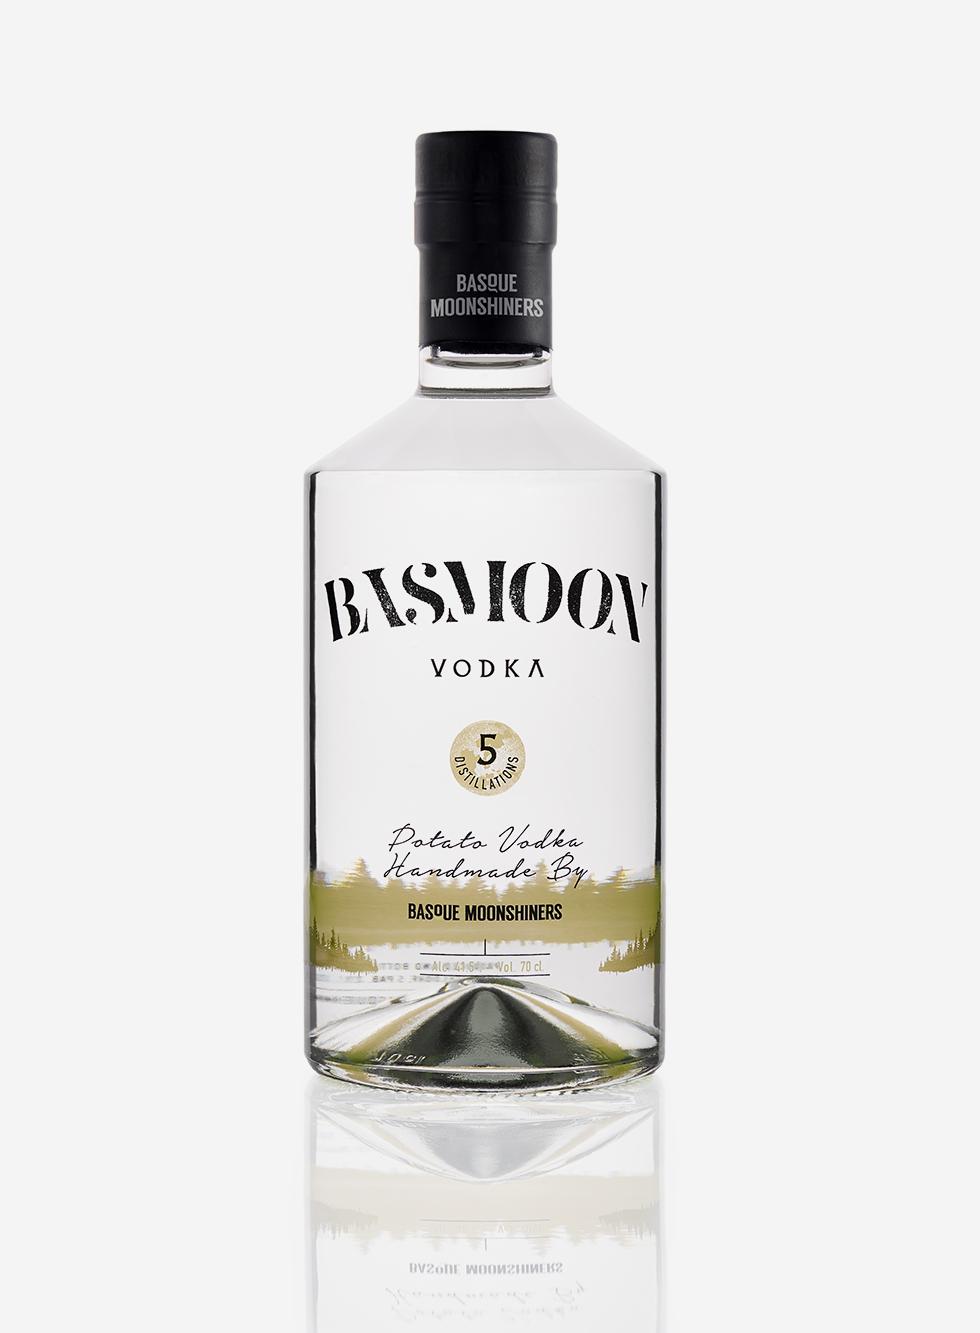 Basmoon-Vodka-botella